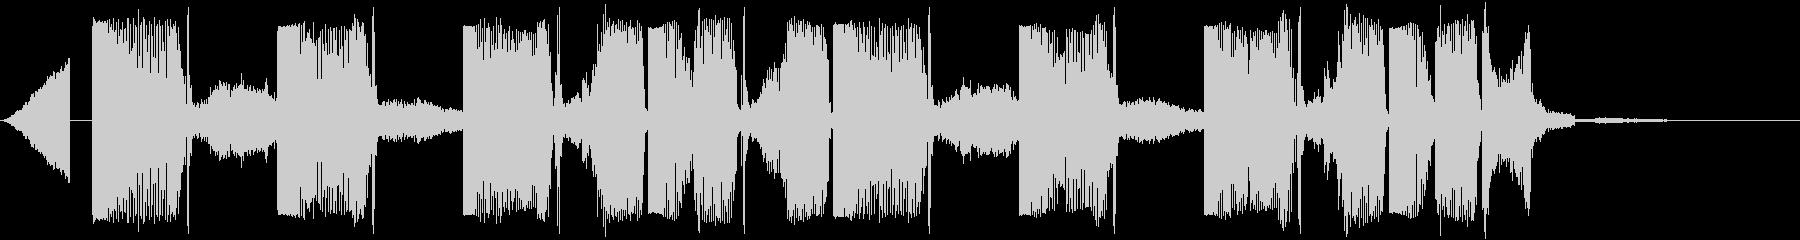 Kawaii系のポップなジングルの未再生の波形